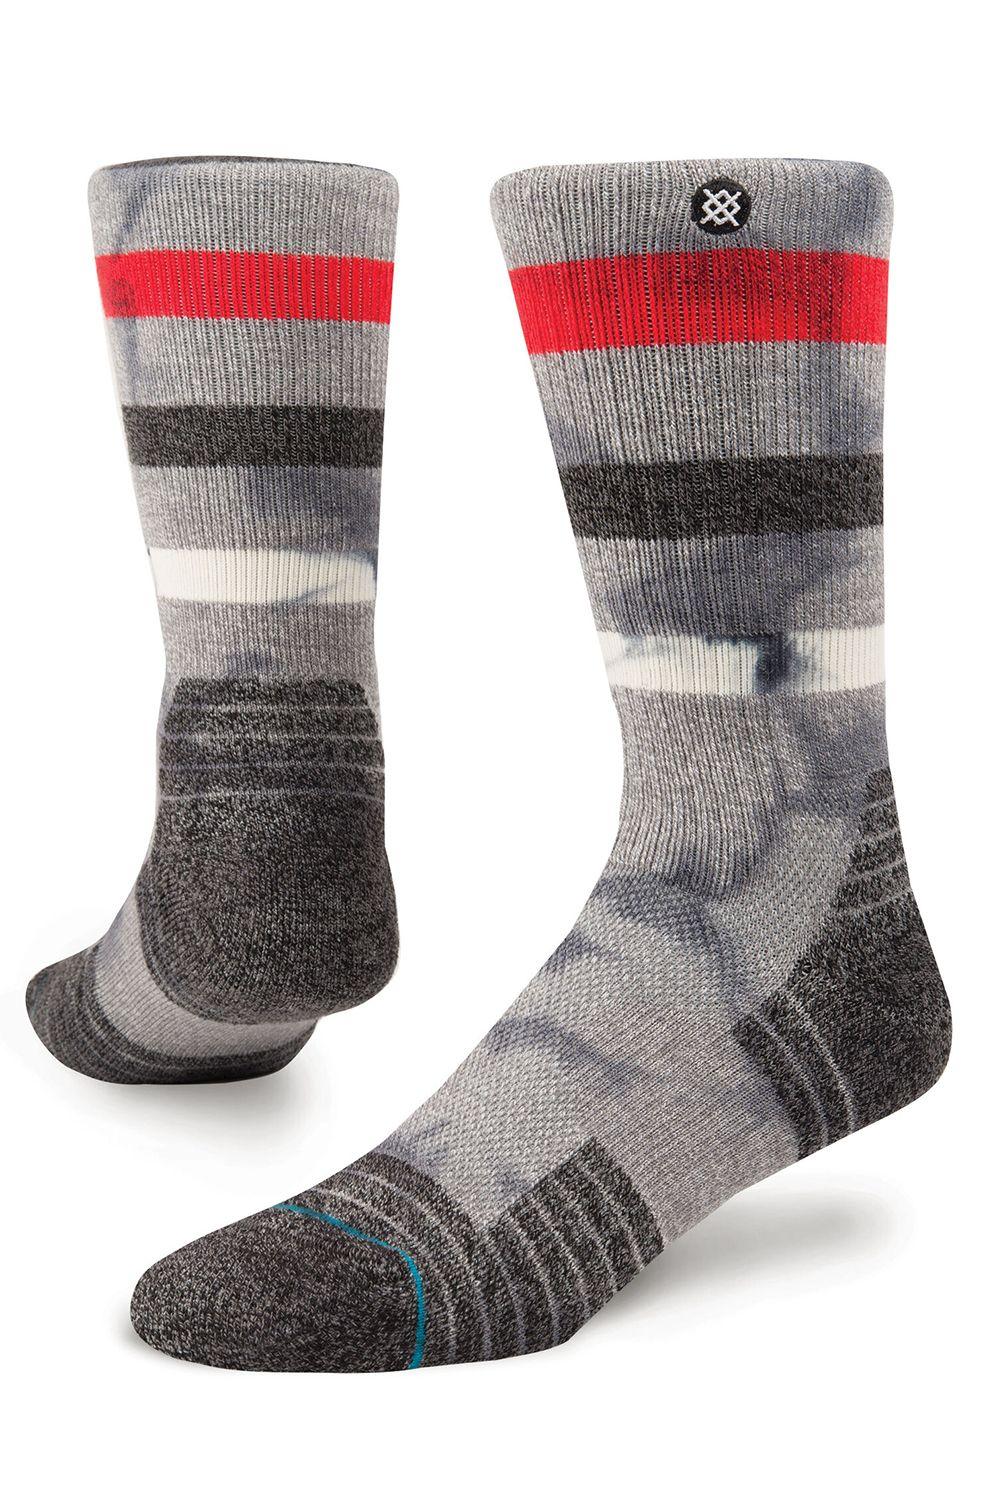 Stance Socks COLBY Grey